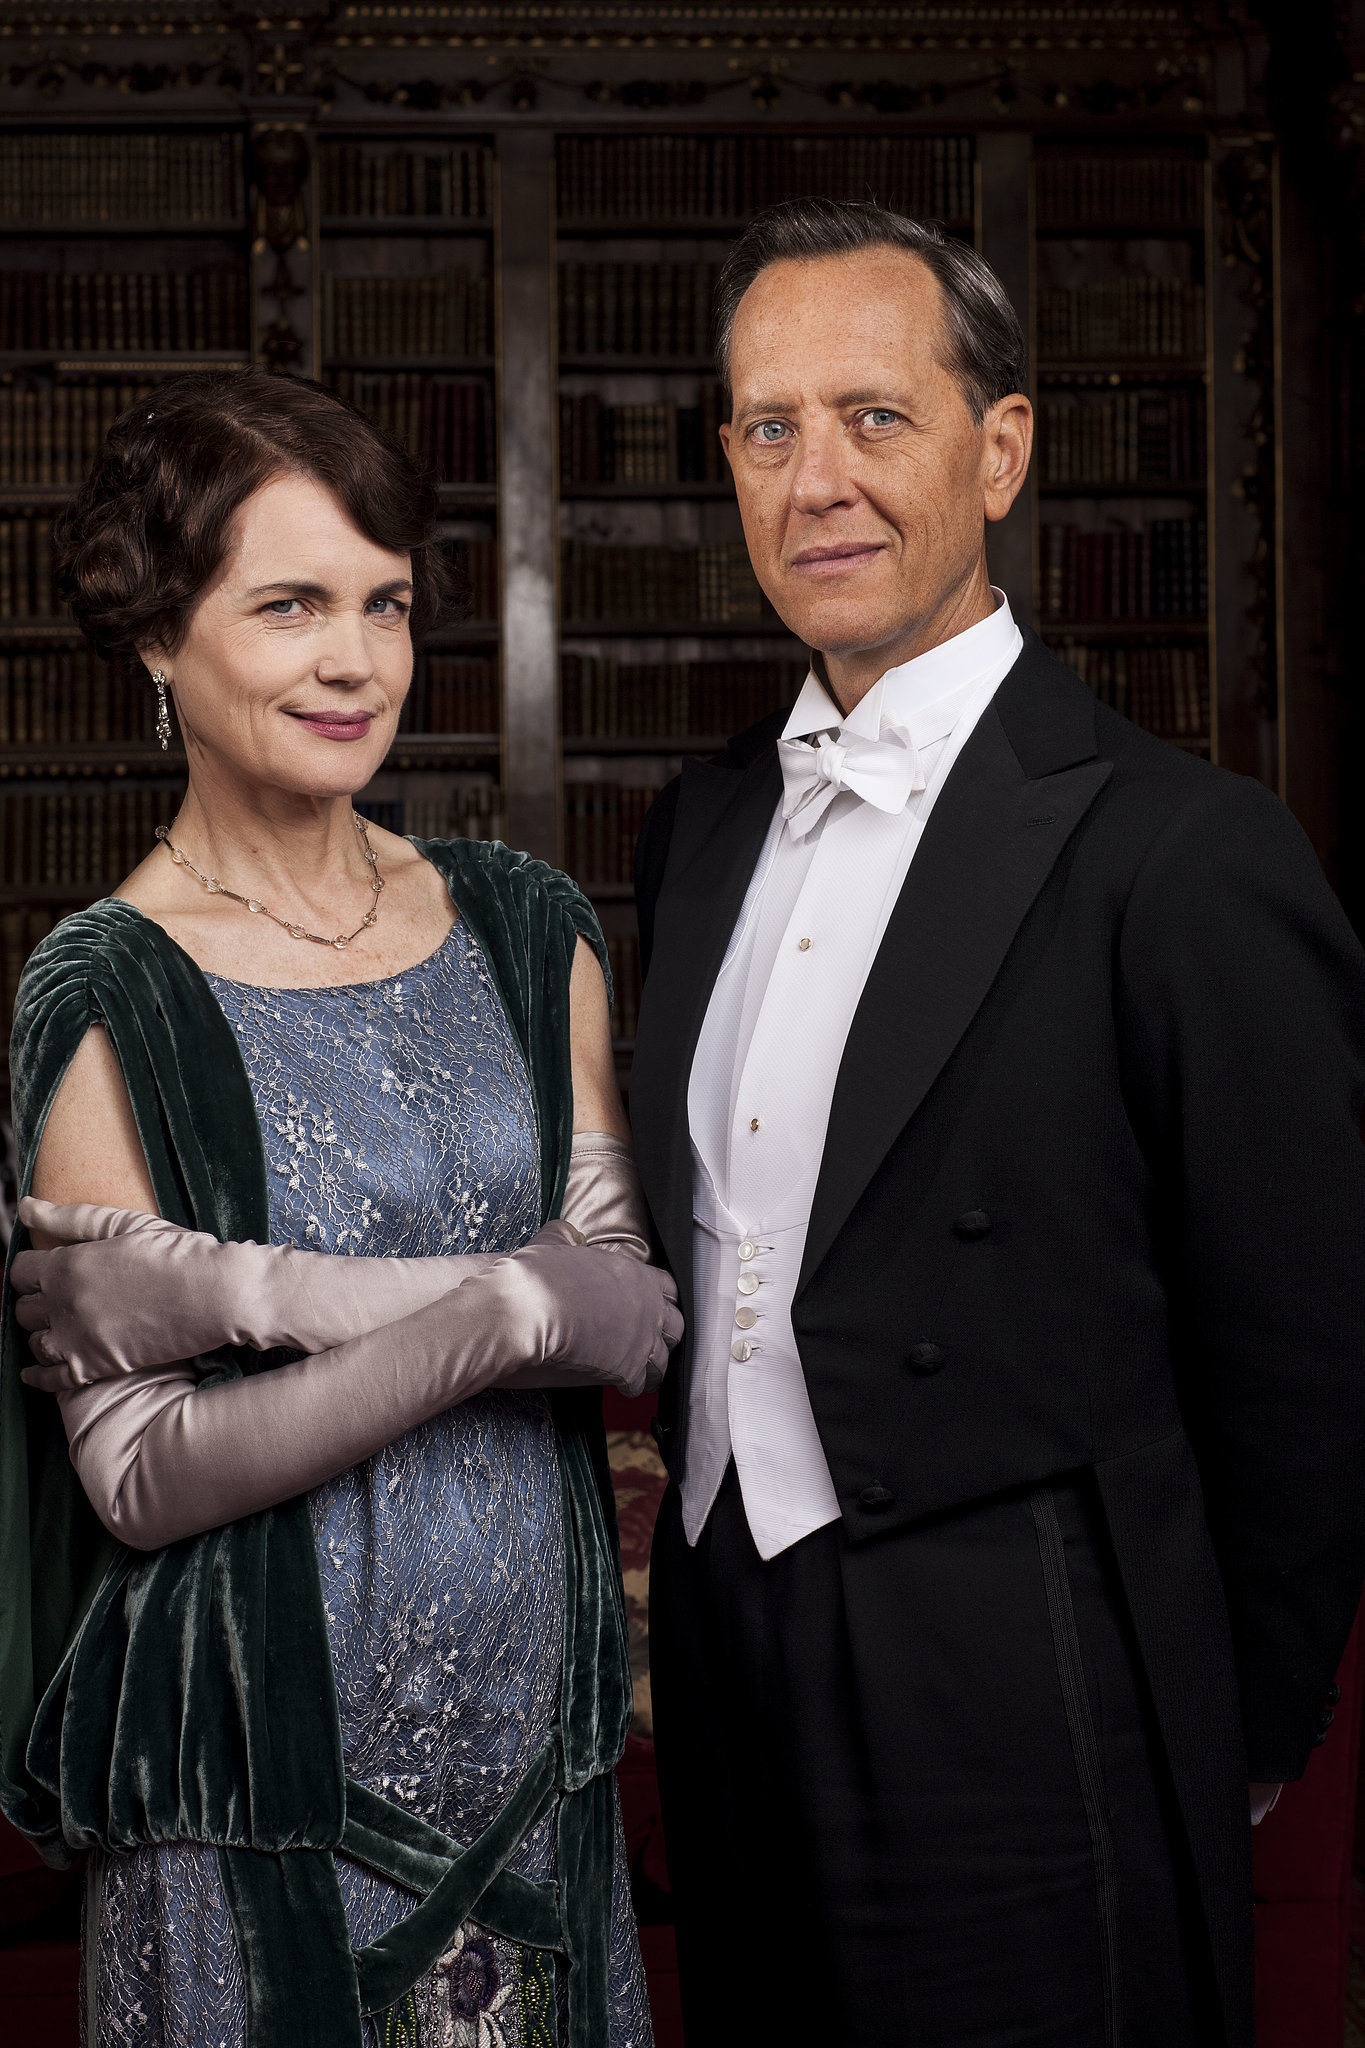 Cora Crawley (Elizabeth McGovern) and Simon Bicker (Richard E. Grant) look glamorous.